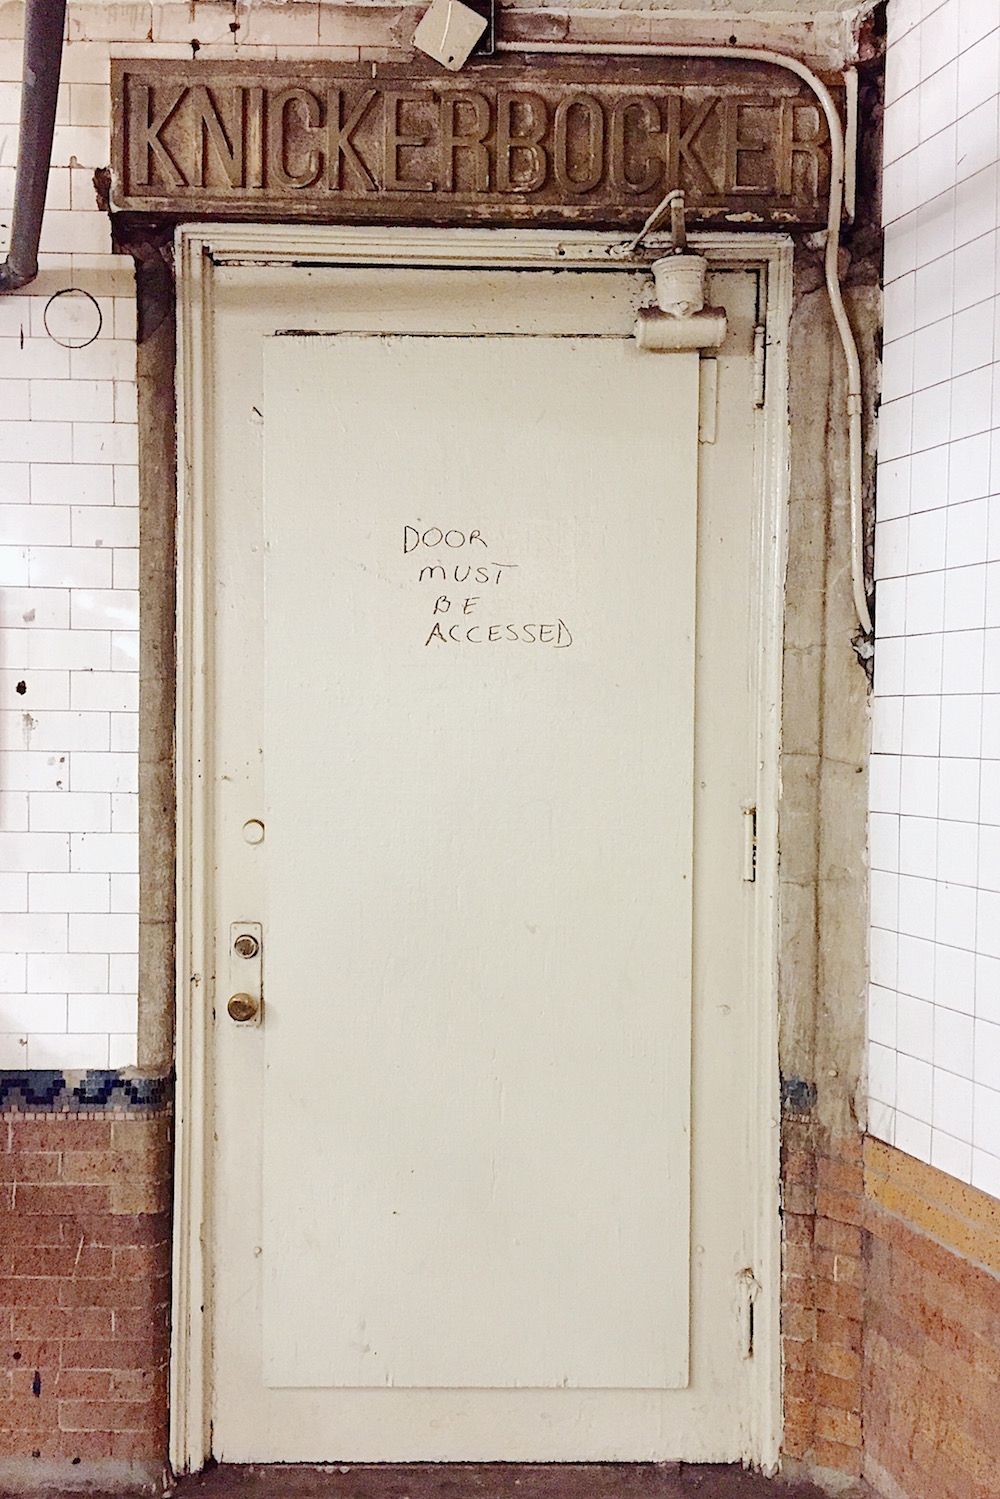 forgotten doorway knickerbocker hotel times square